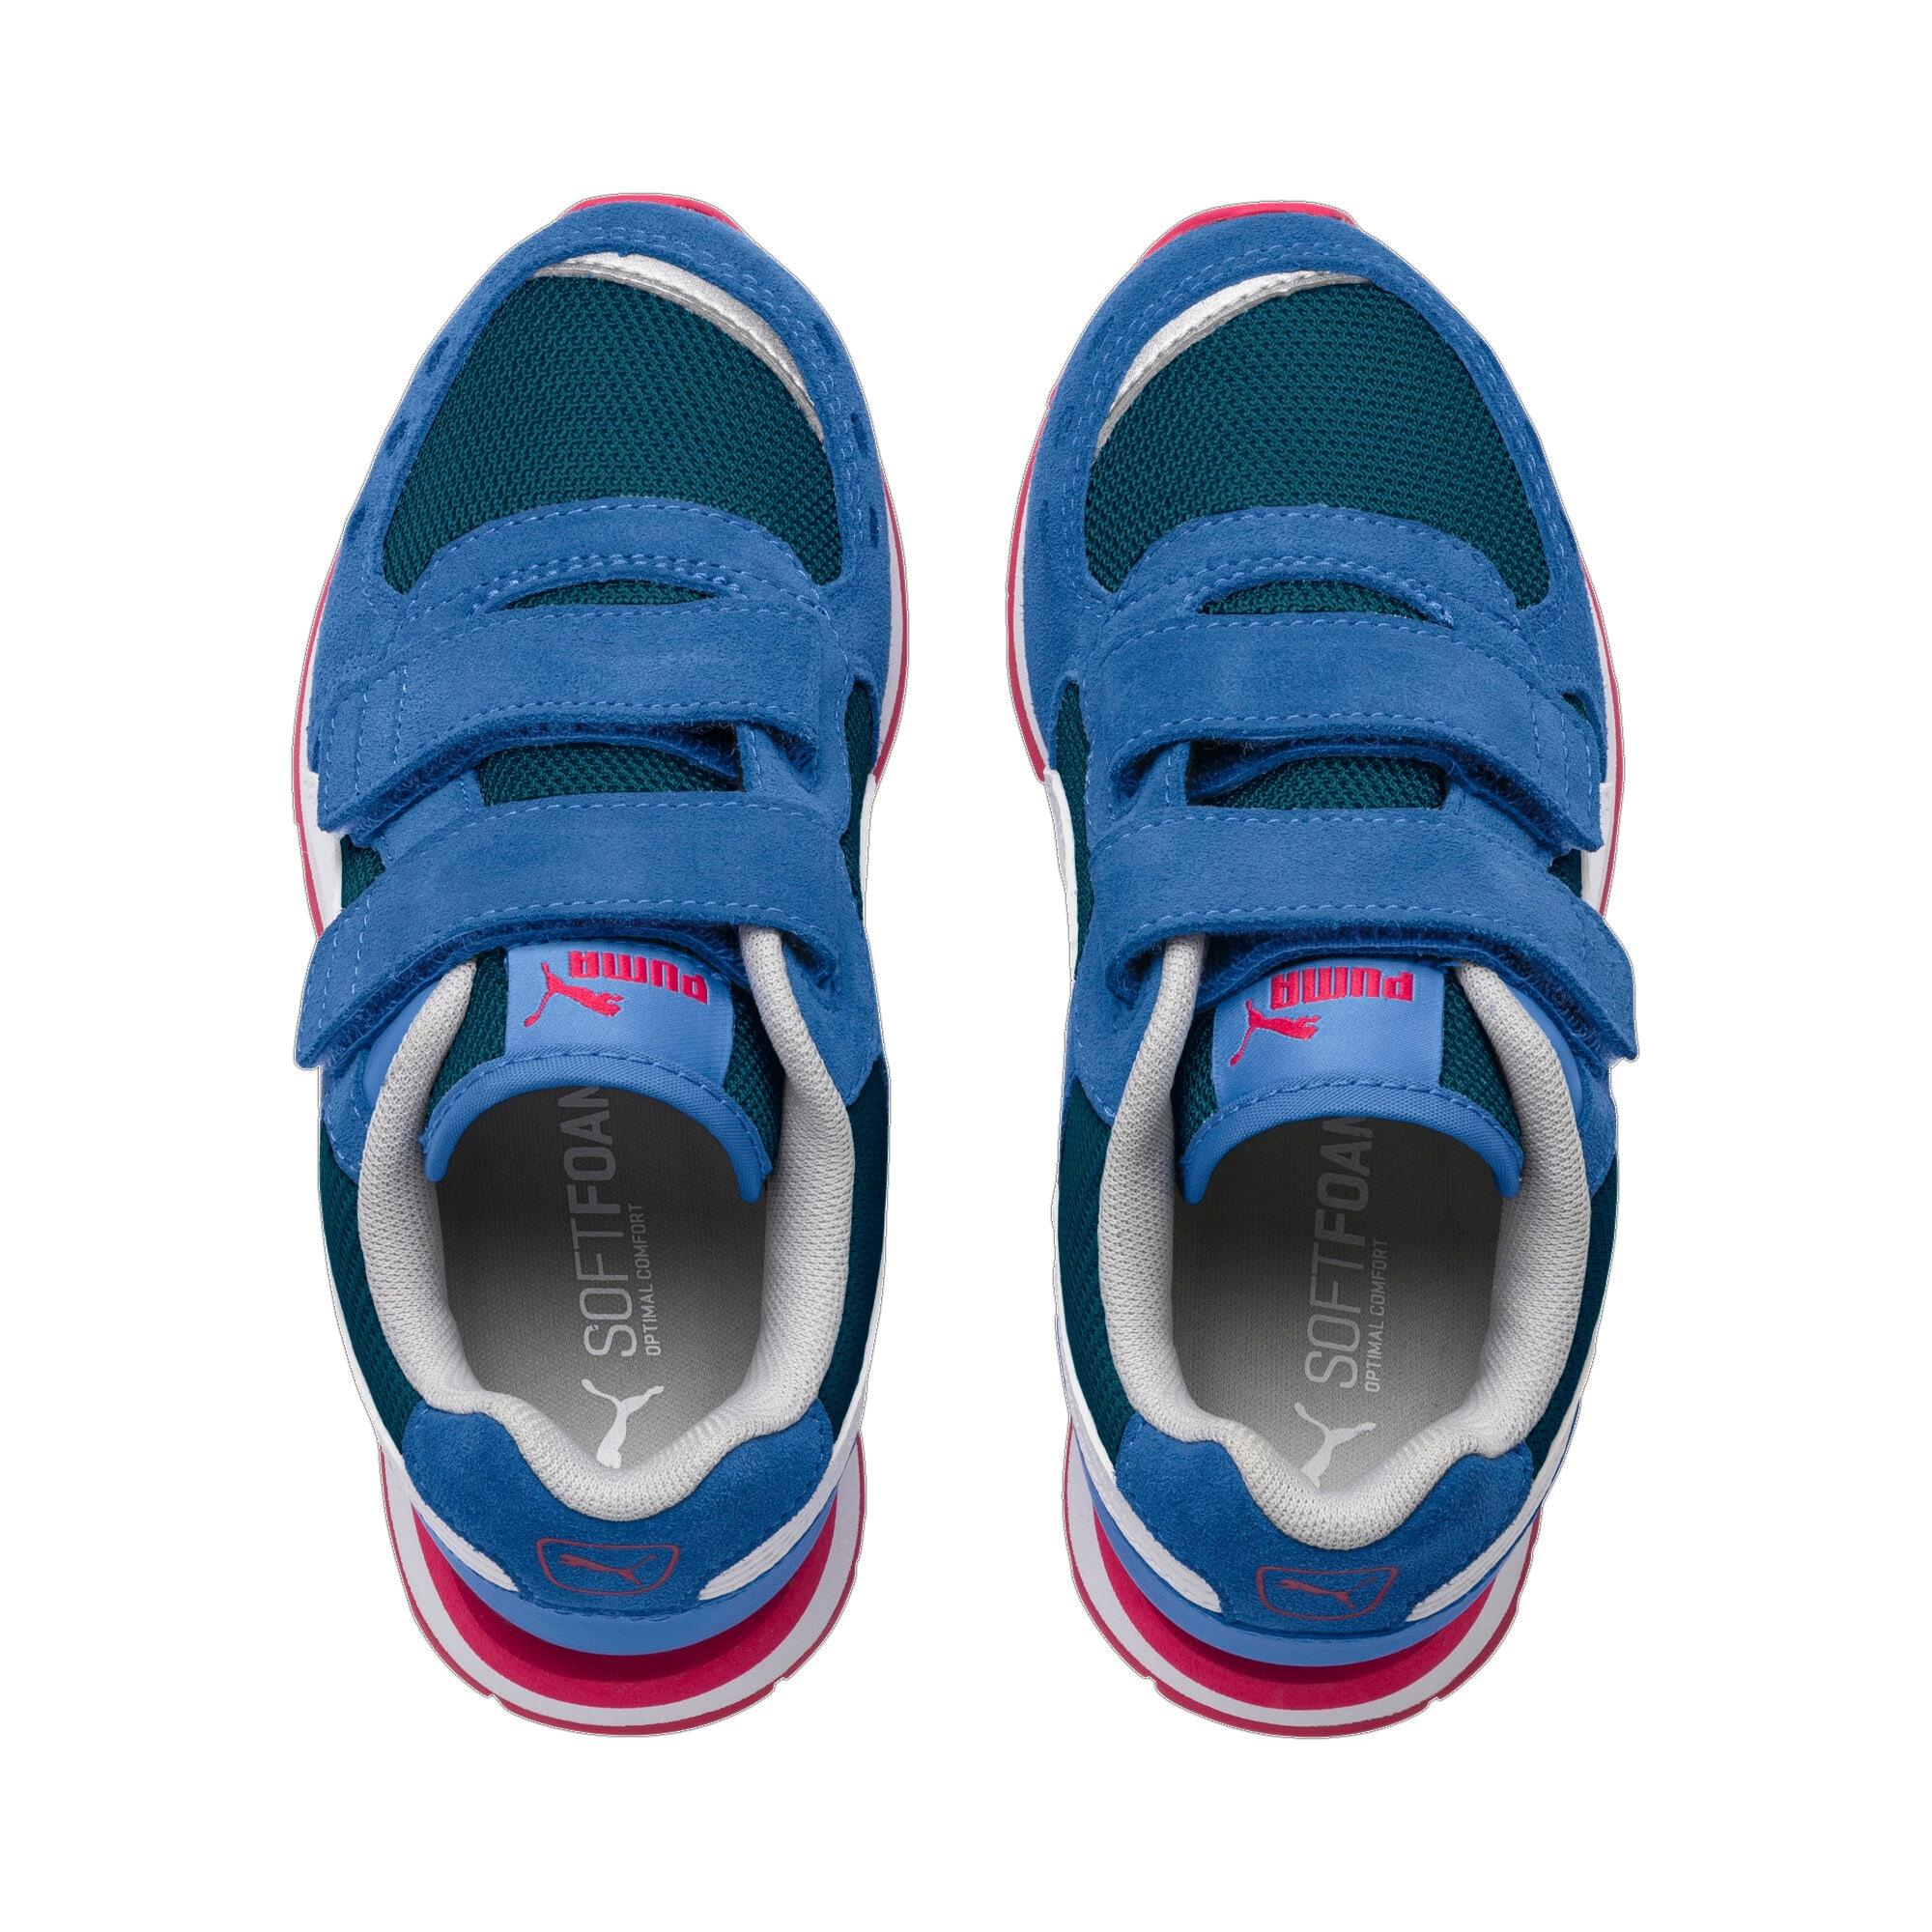 Miniatura 6 de Zapatos Vista para niños, Ultramarine-Puma White, mediano